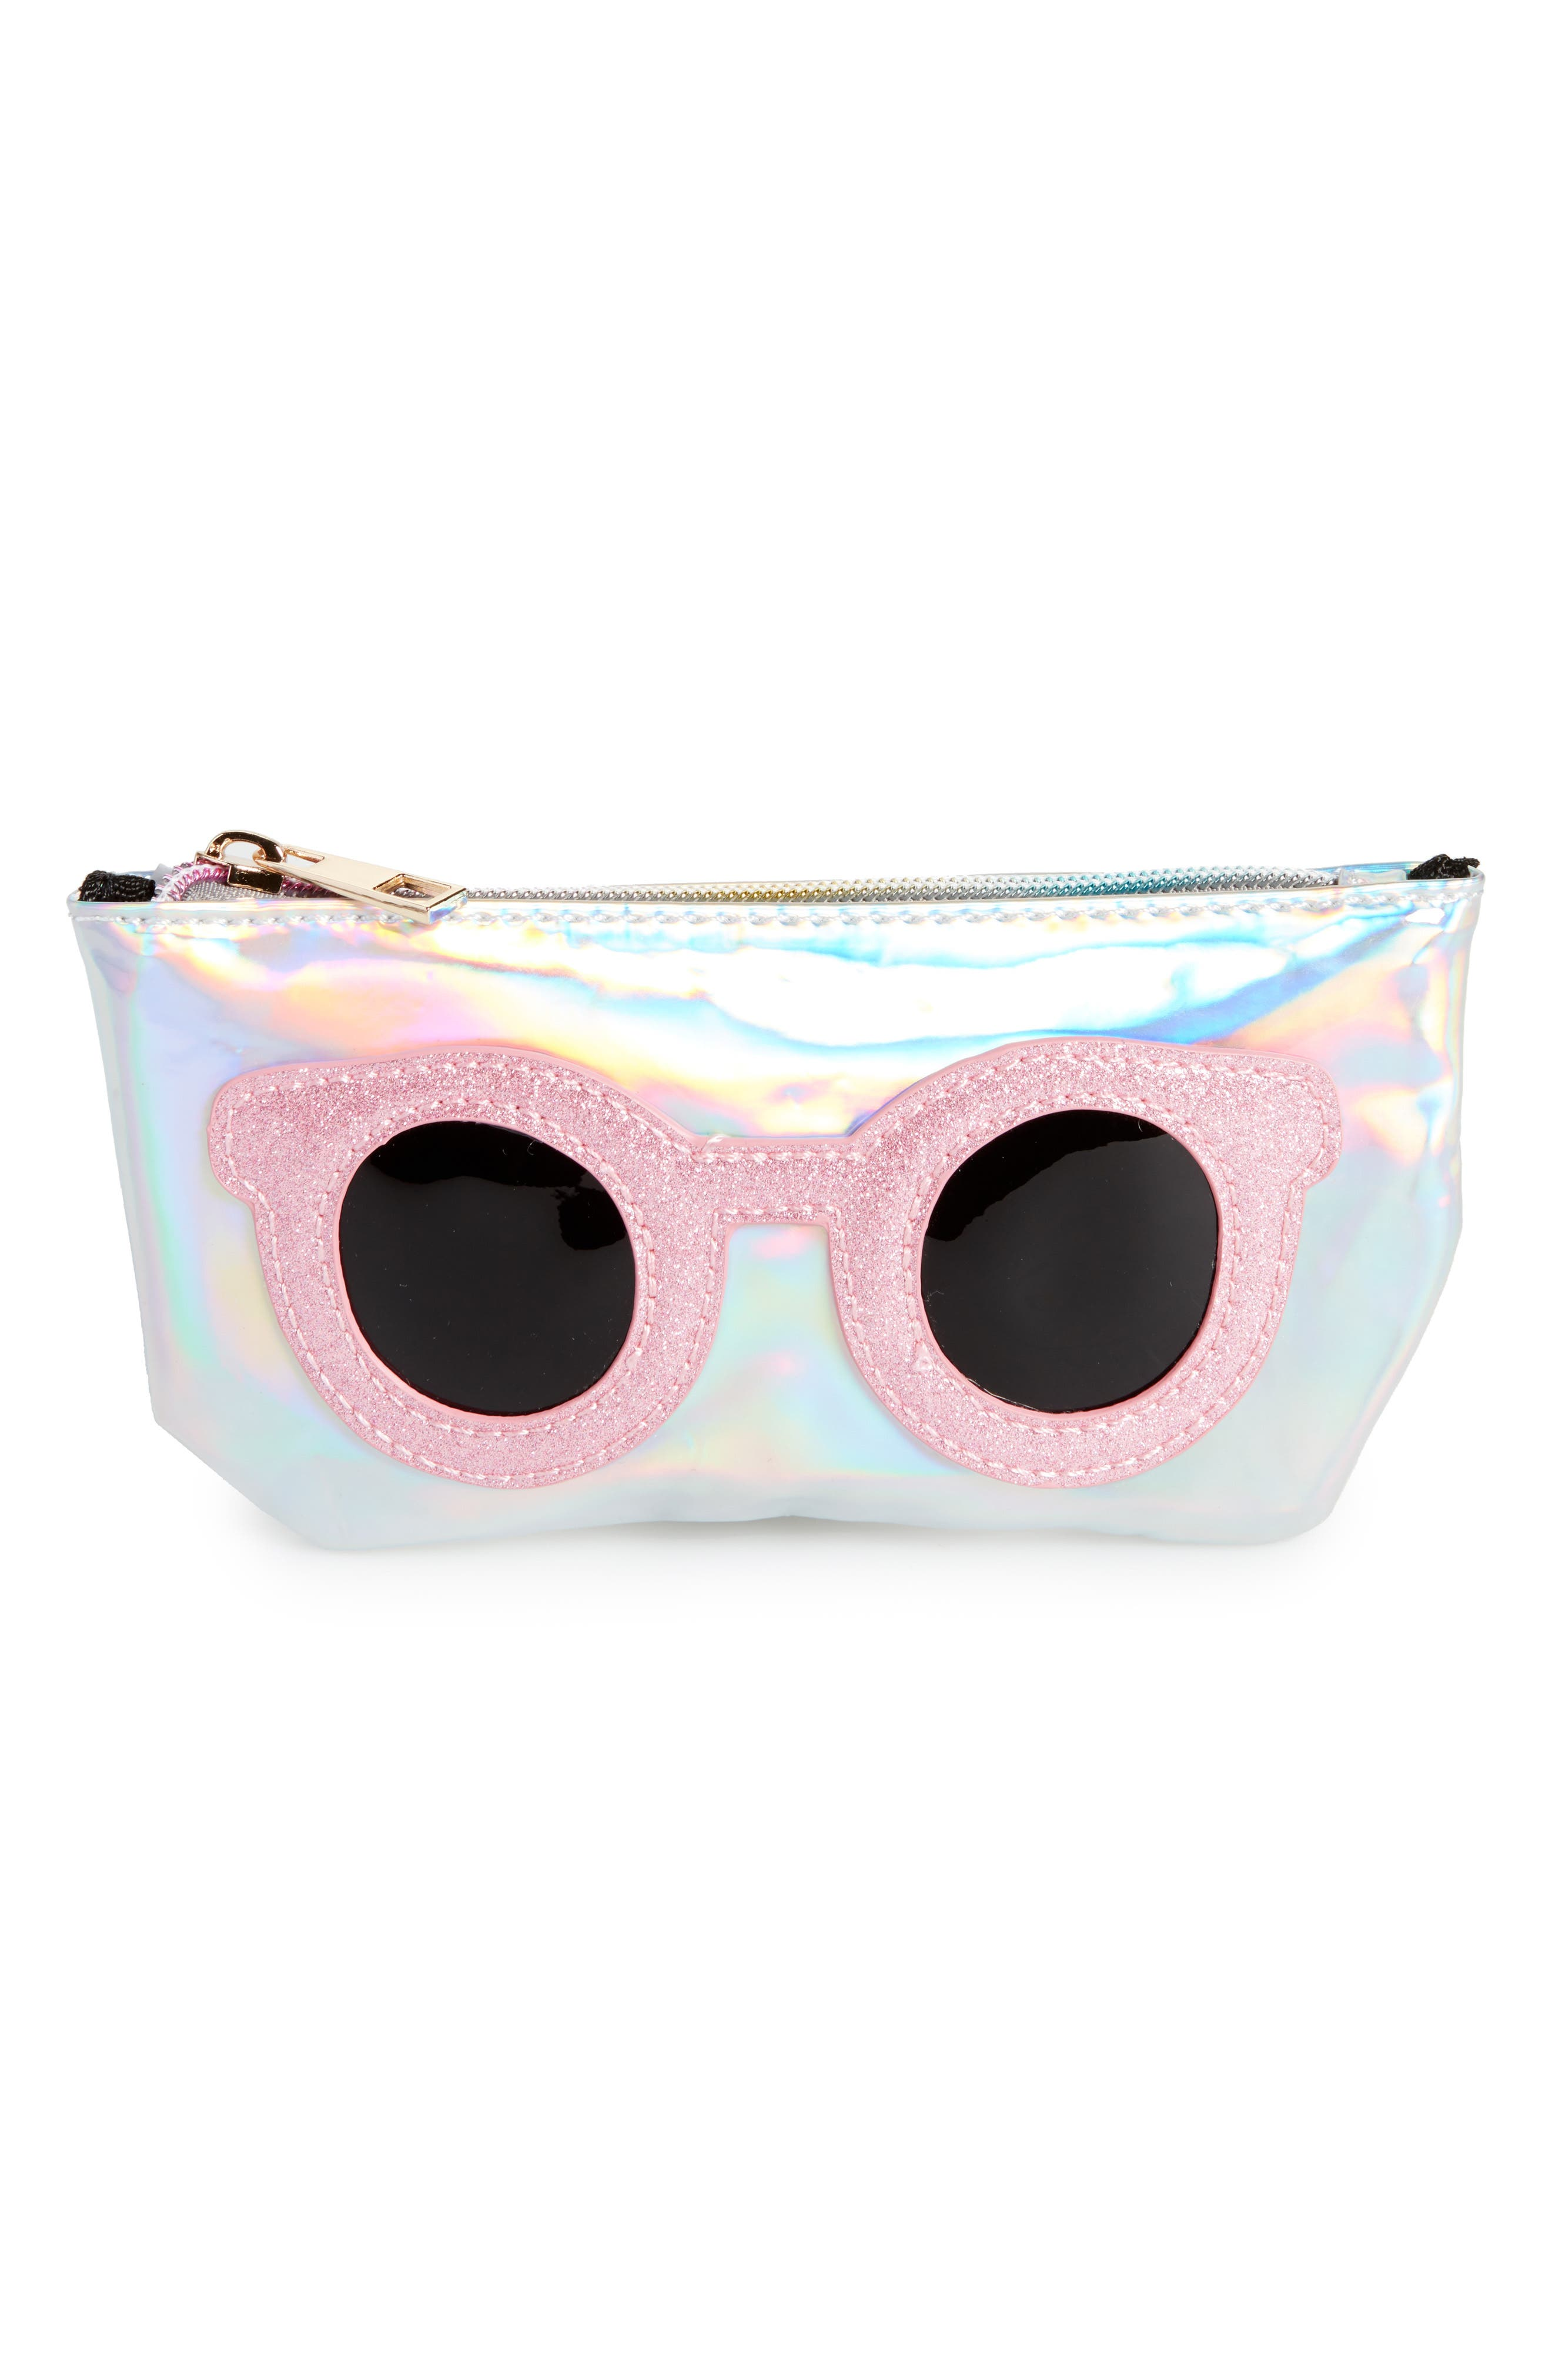 Main Image - OMG Metallic Sunnies Sunglasses Case